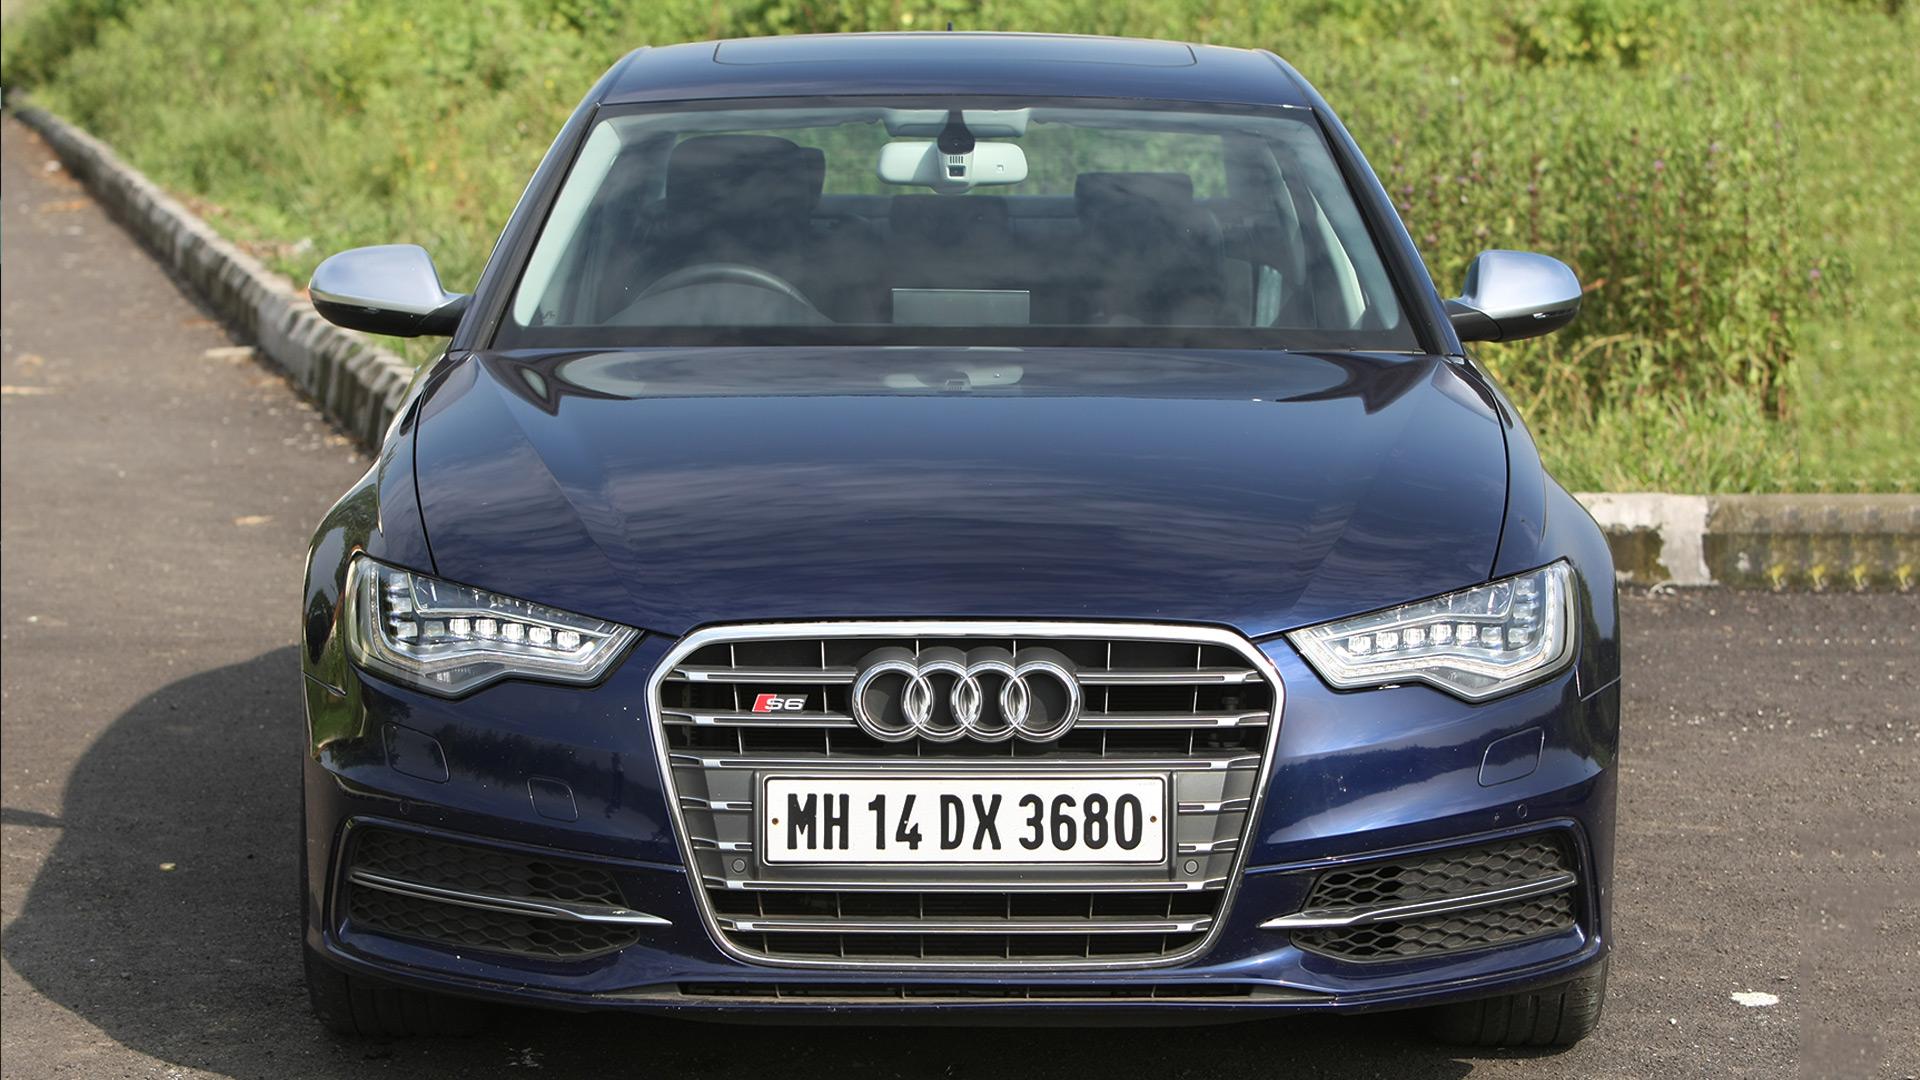 Audi S6 2013 4.0 TFSI quattro